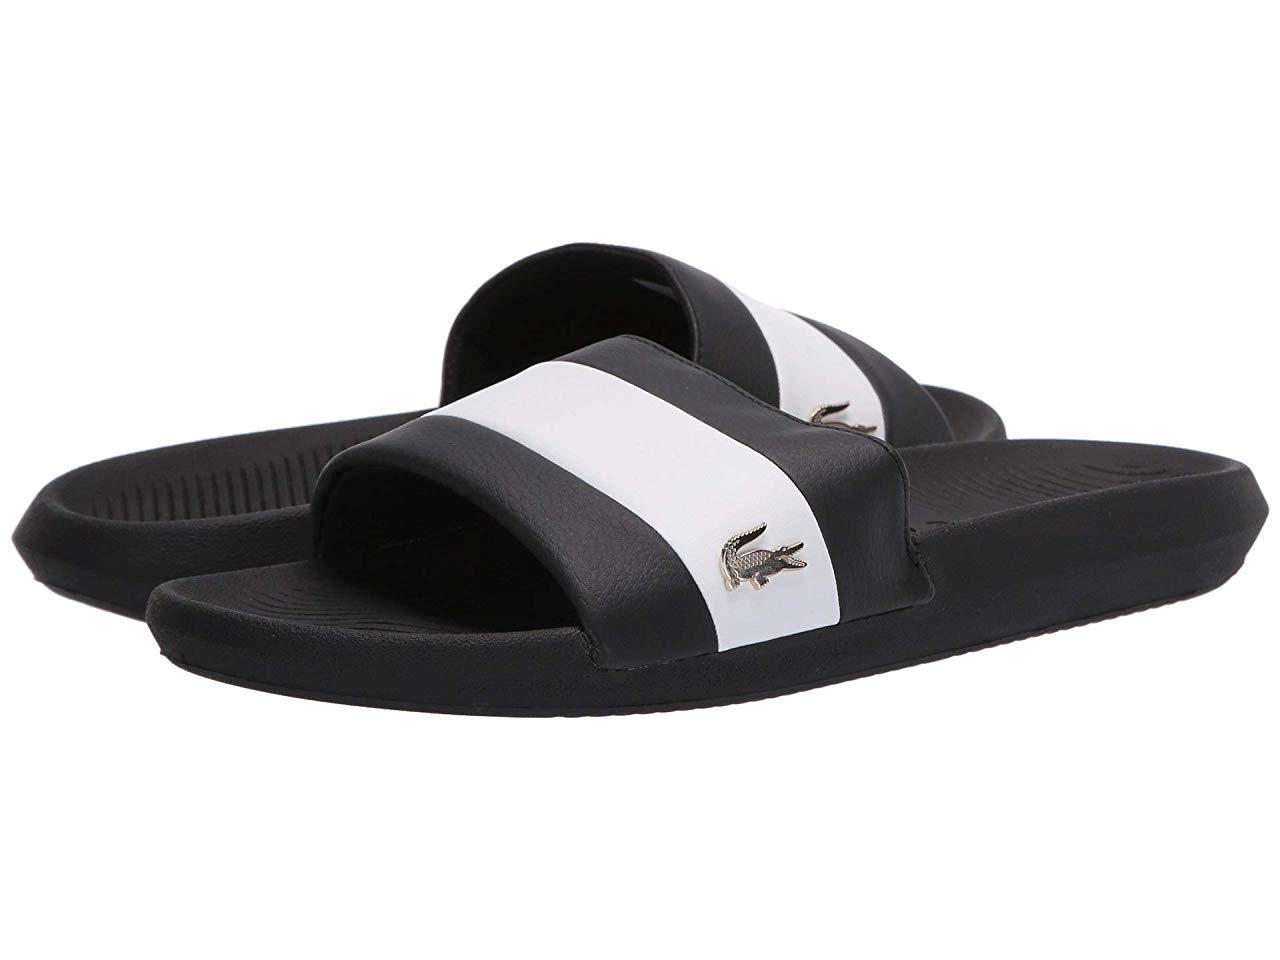 Сандали/Вьетнамки Lacoste Croco Slide 120 3 US Black/White